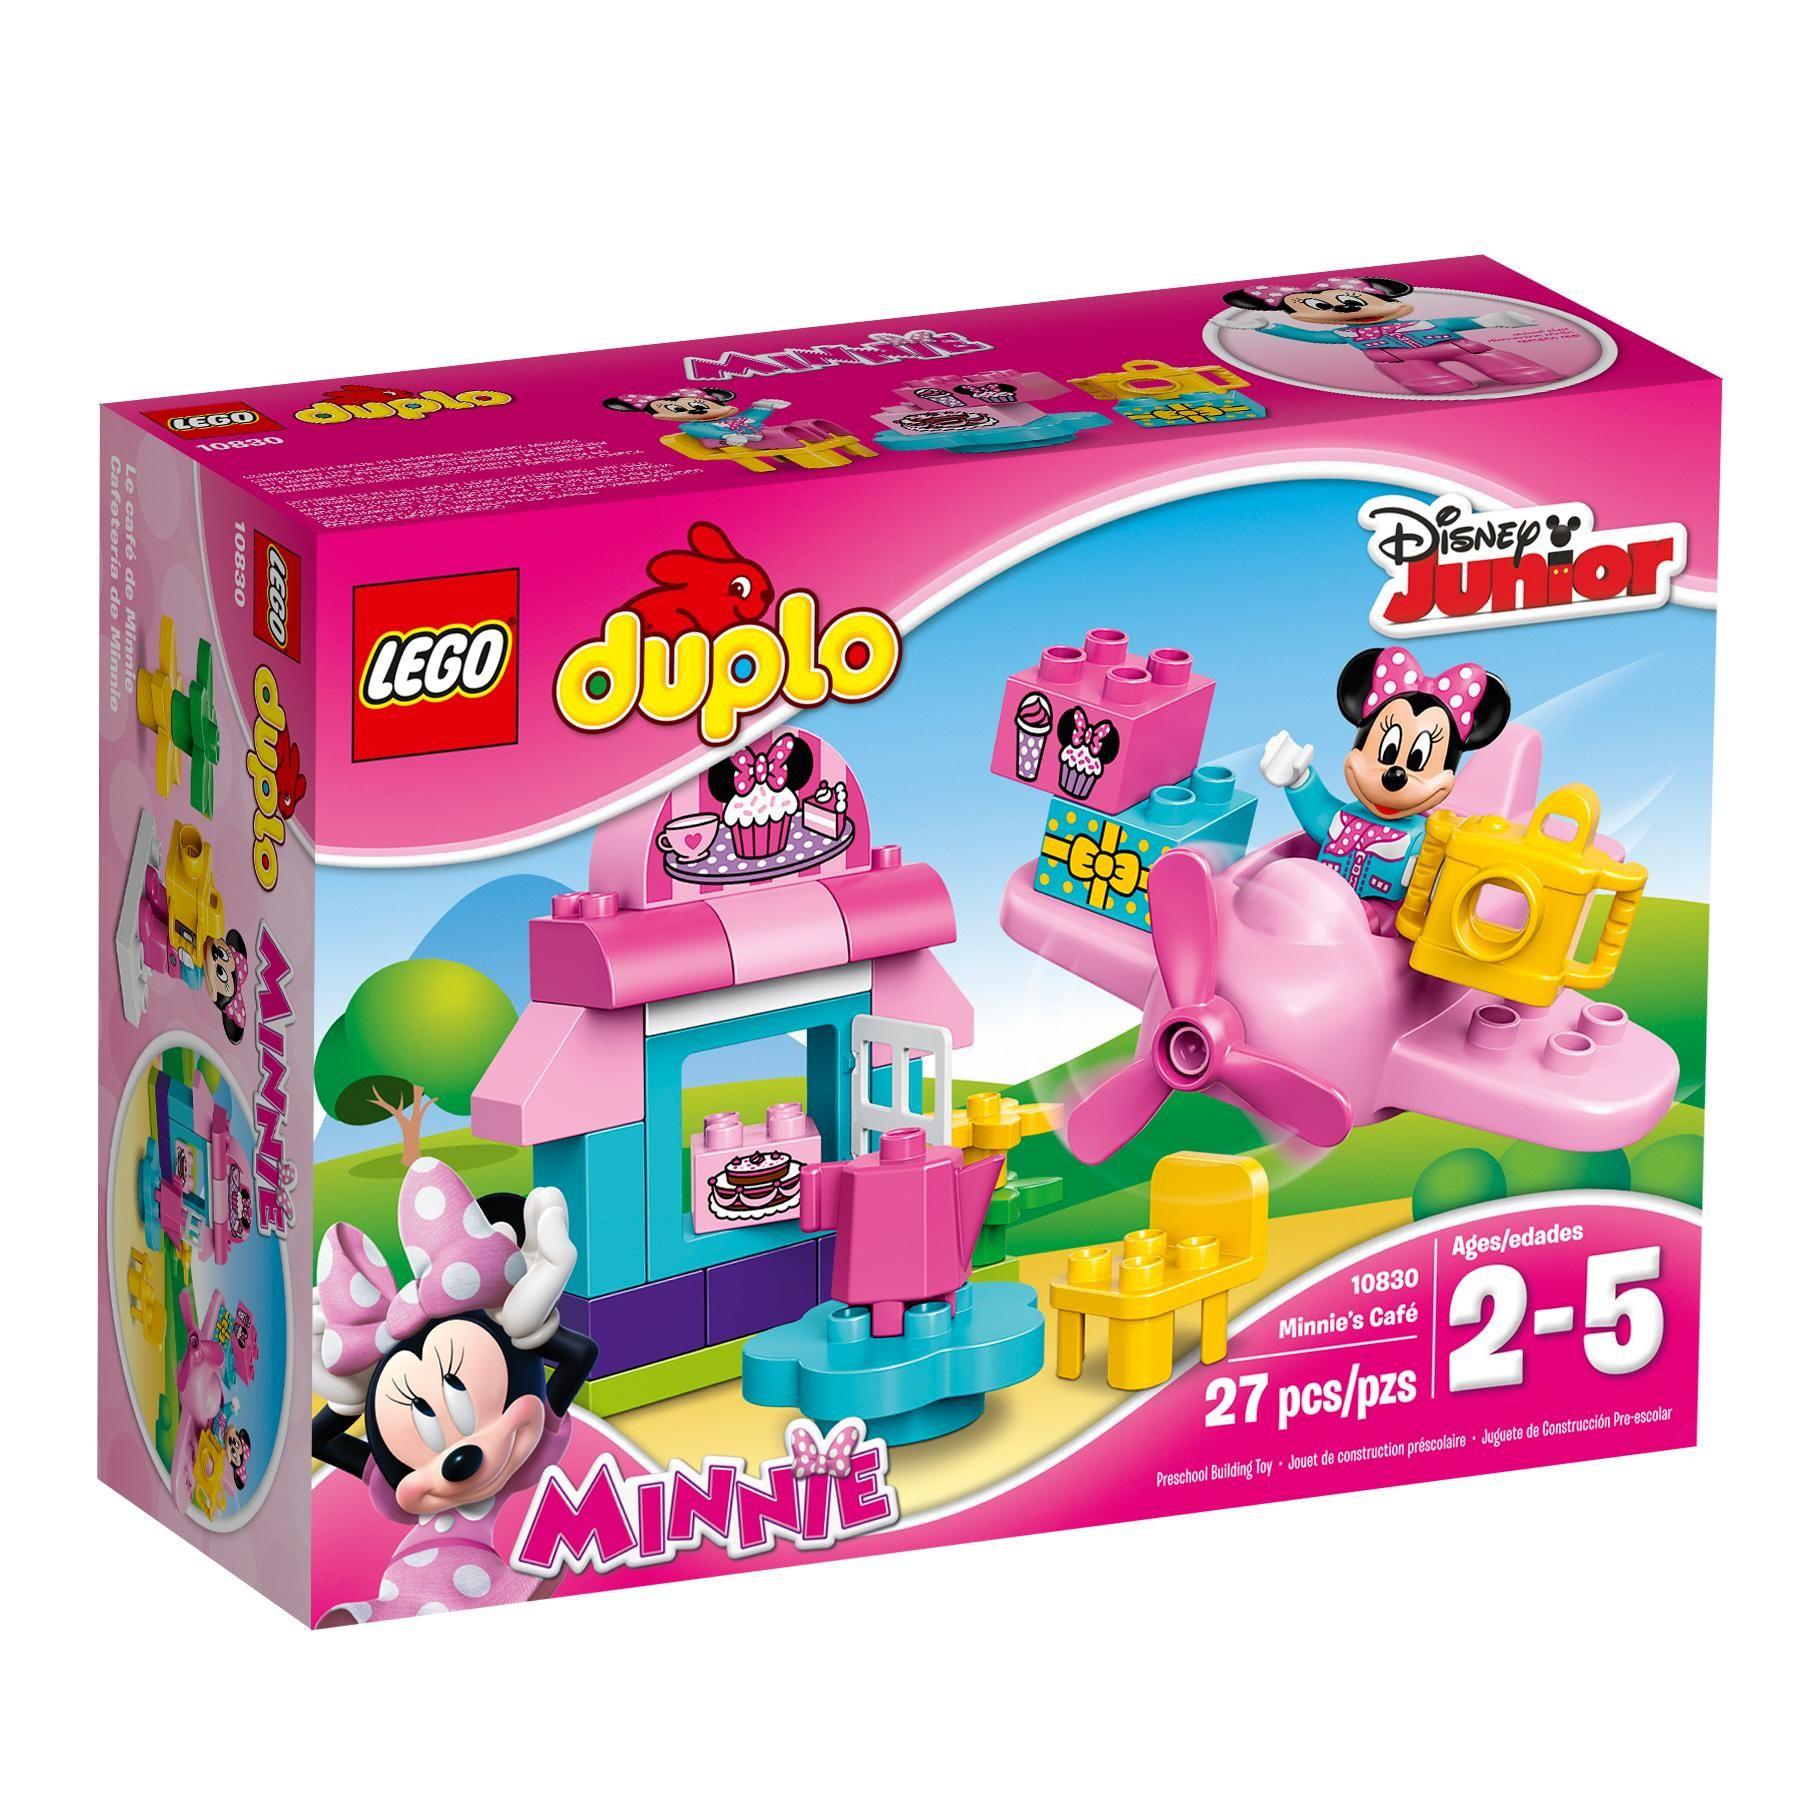 Toddler Puzzles Toddler Girl Toys Toddler Boy Toys Legos For Toddlers Toddler Train Set For Toddlers Lego Duplo Preschool Toys Blocks Preschool